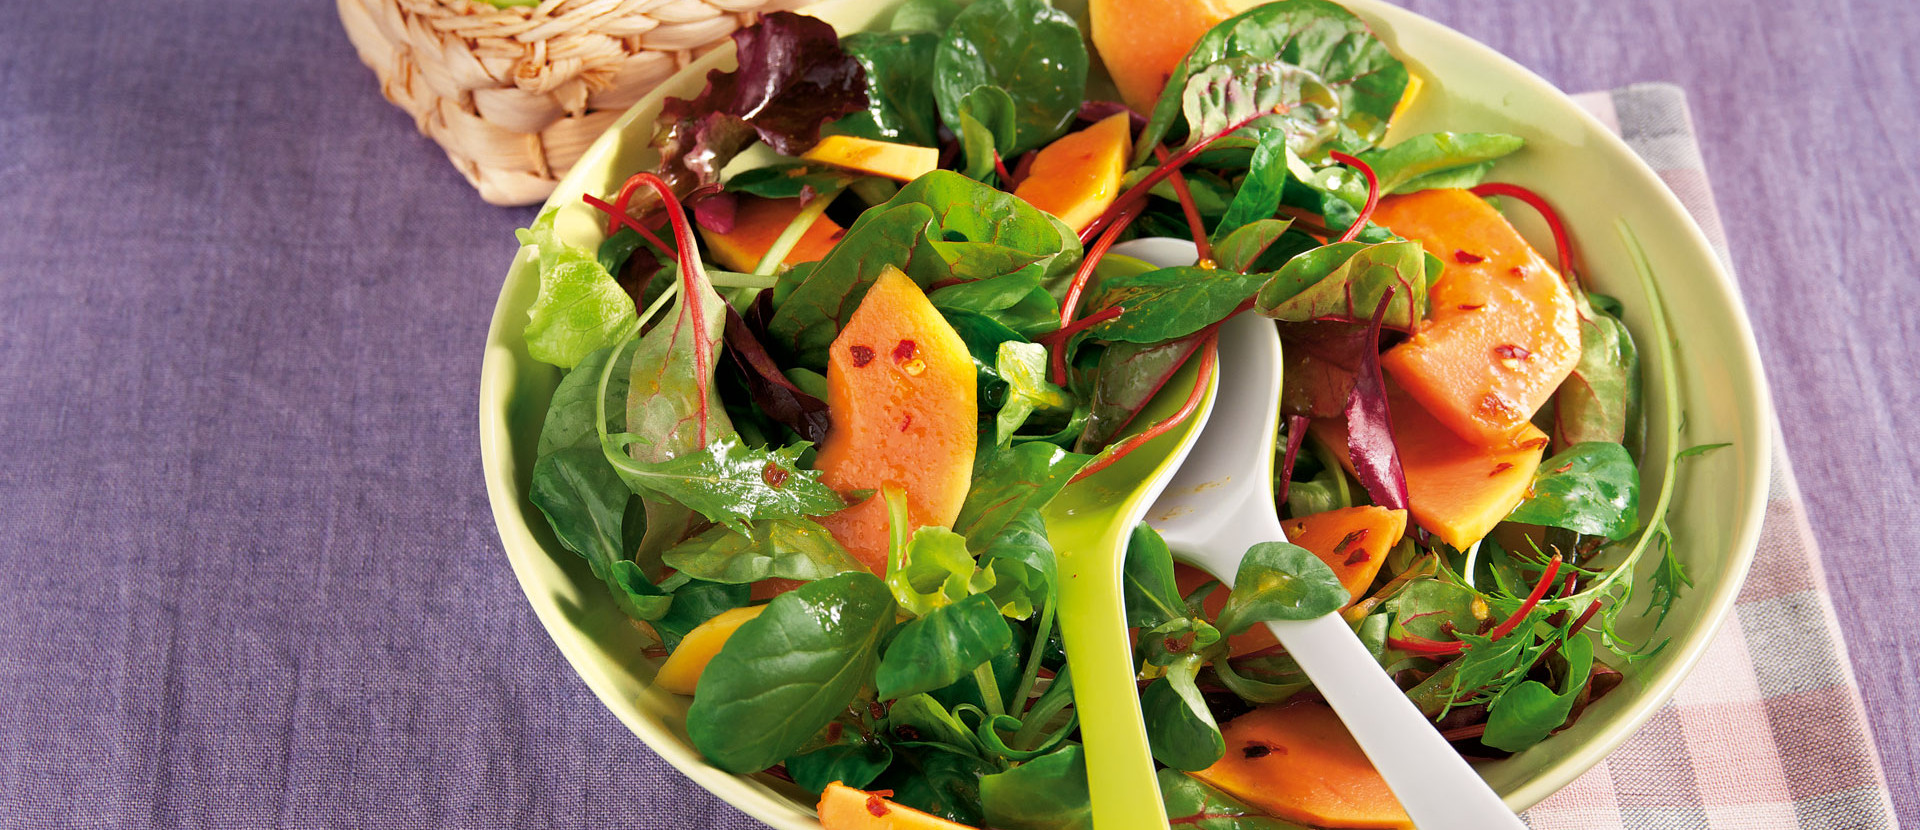 Wuerziger Salat mit Papaya und Mini Croissants